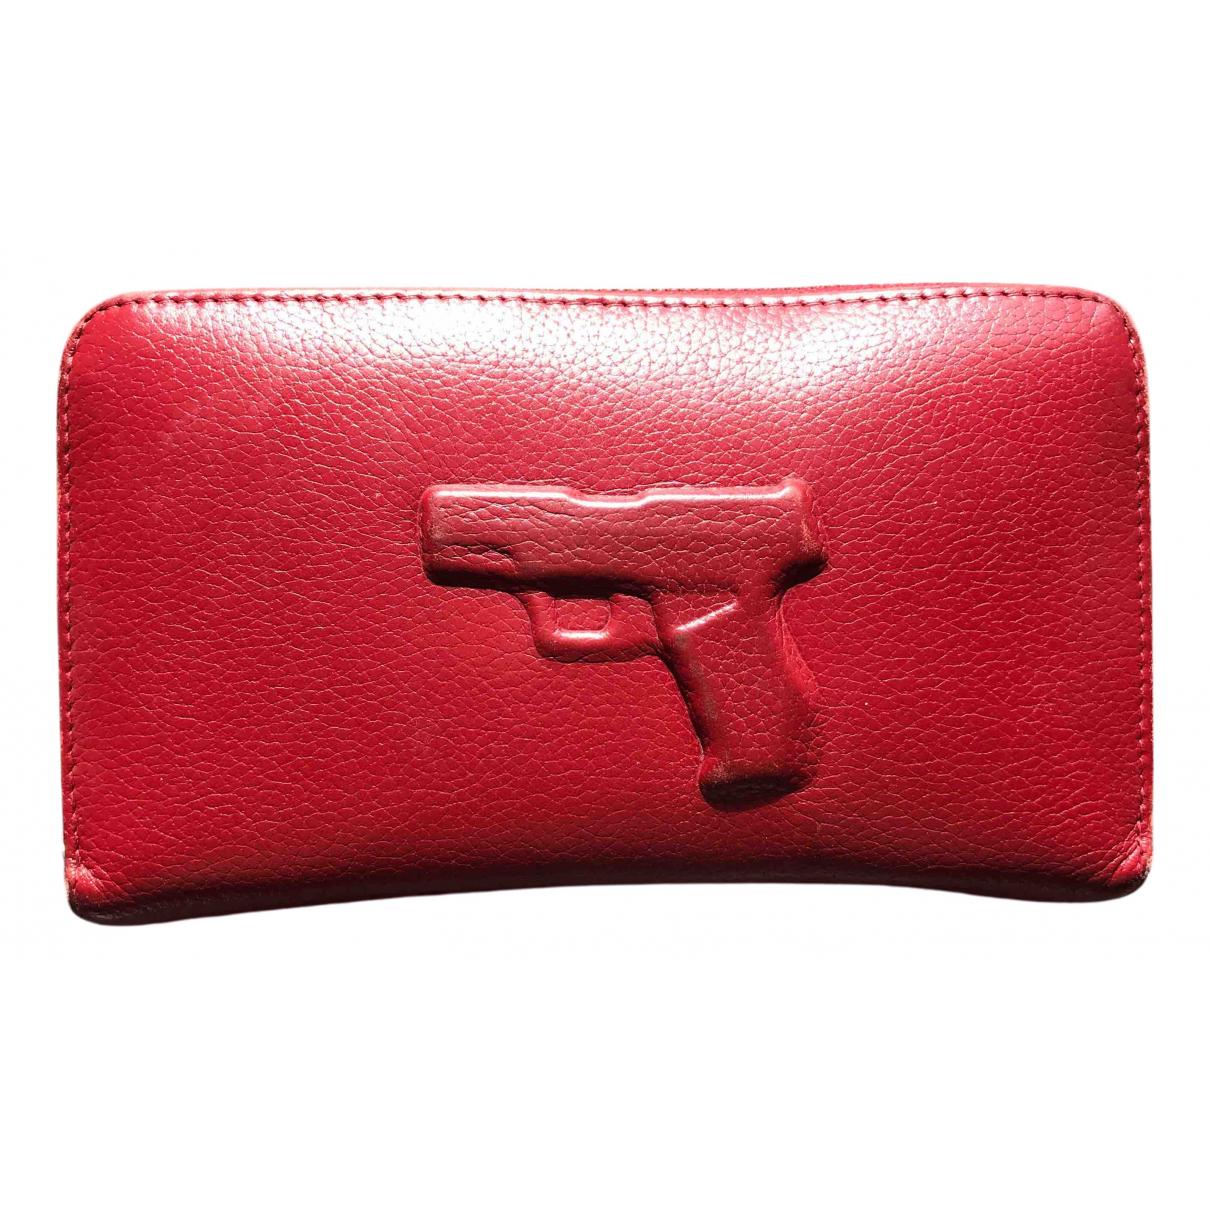 Vlieger & Vandam N Red Leather wallet for Women N